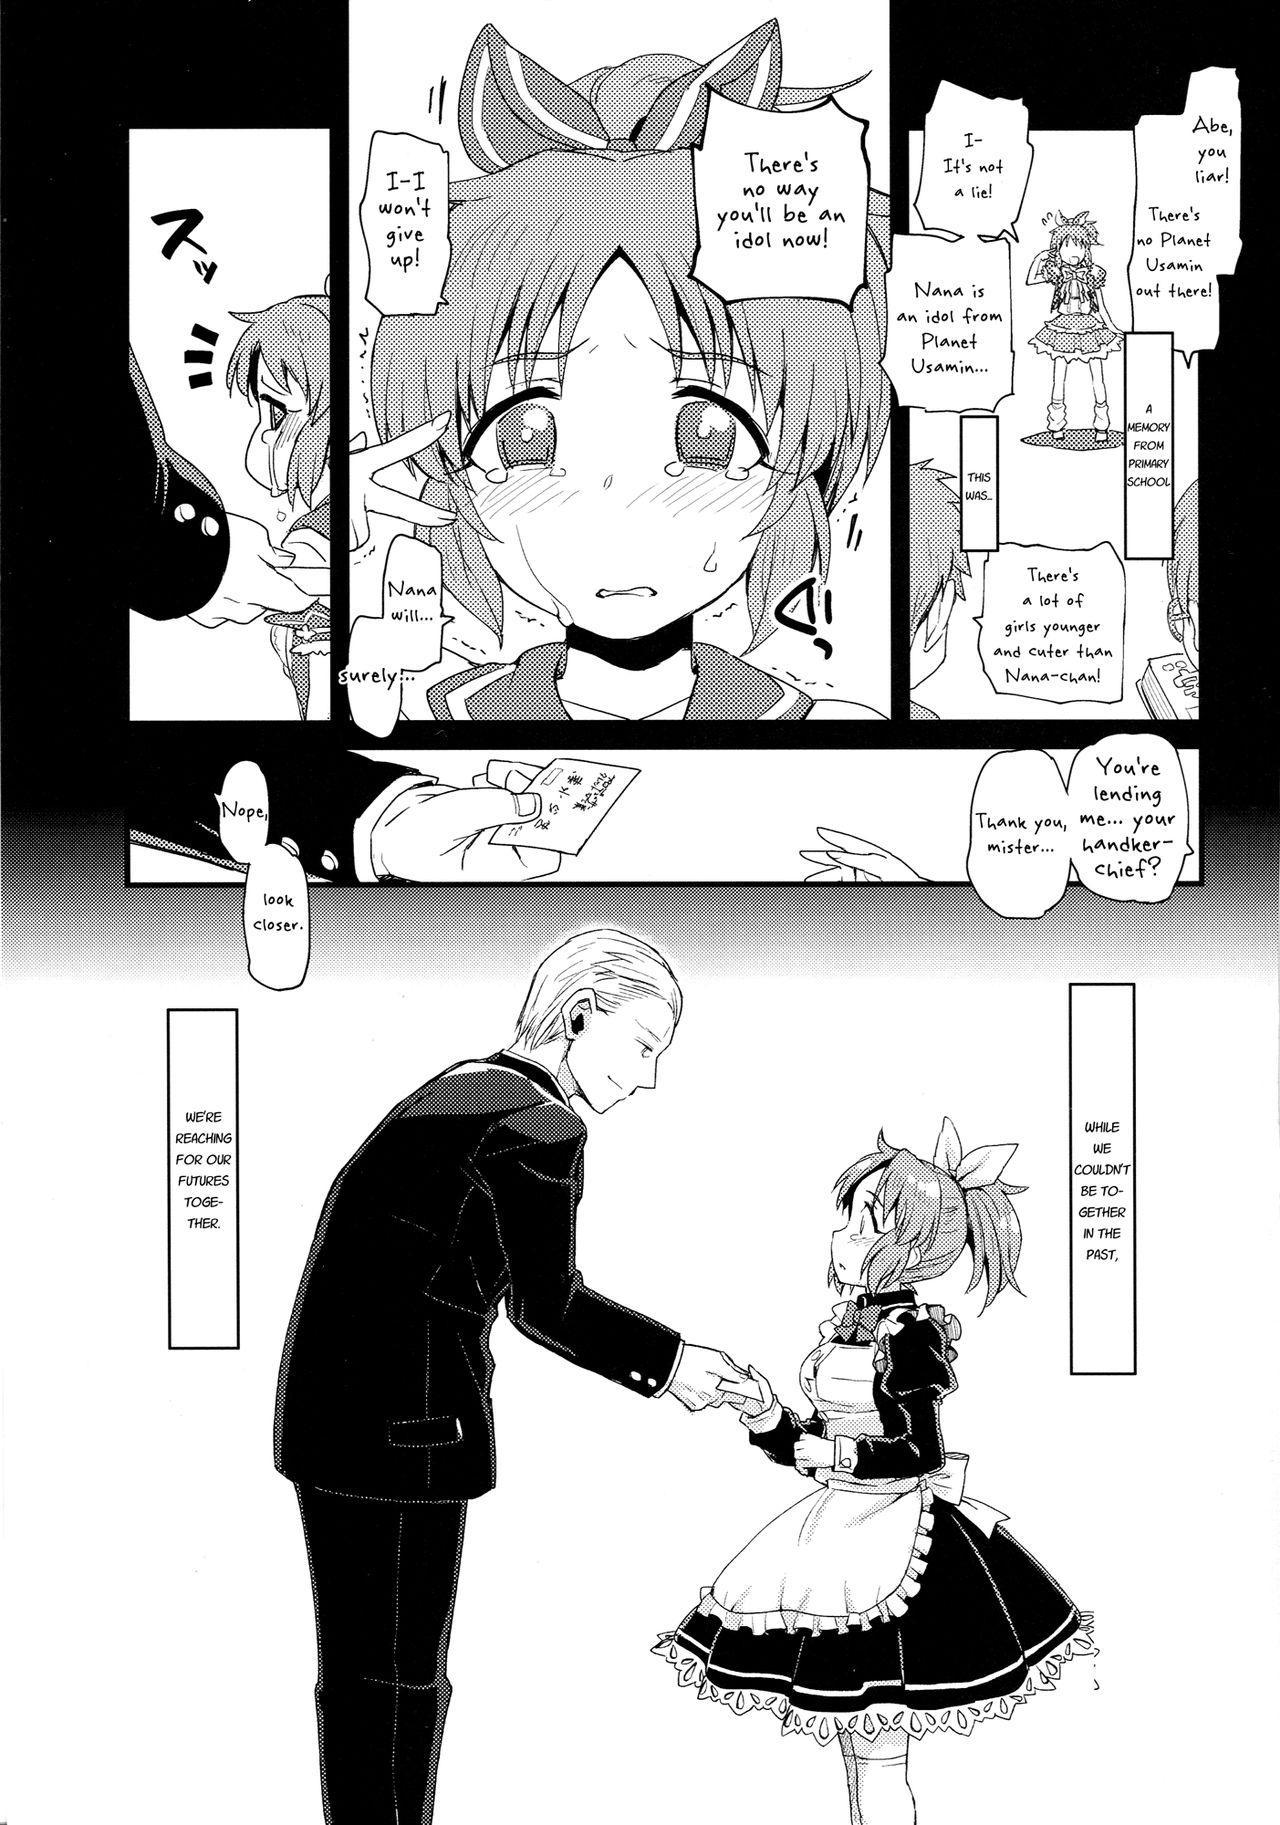 Usamin-sei kara Asagaeri | Coming Home from Usamin Star in the Morning 19